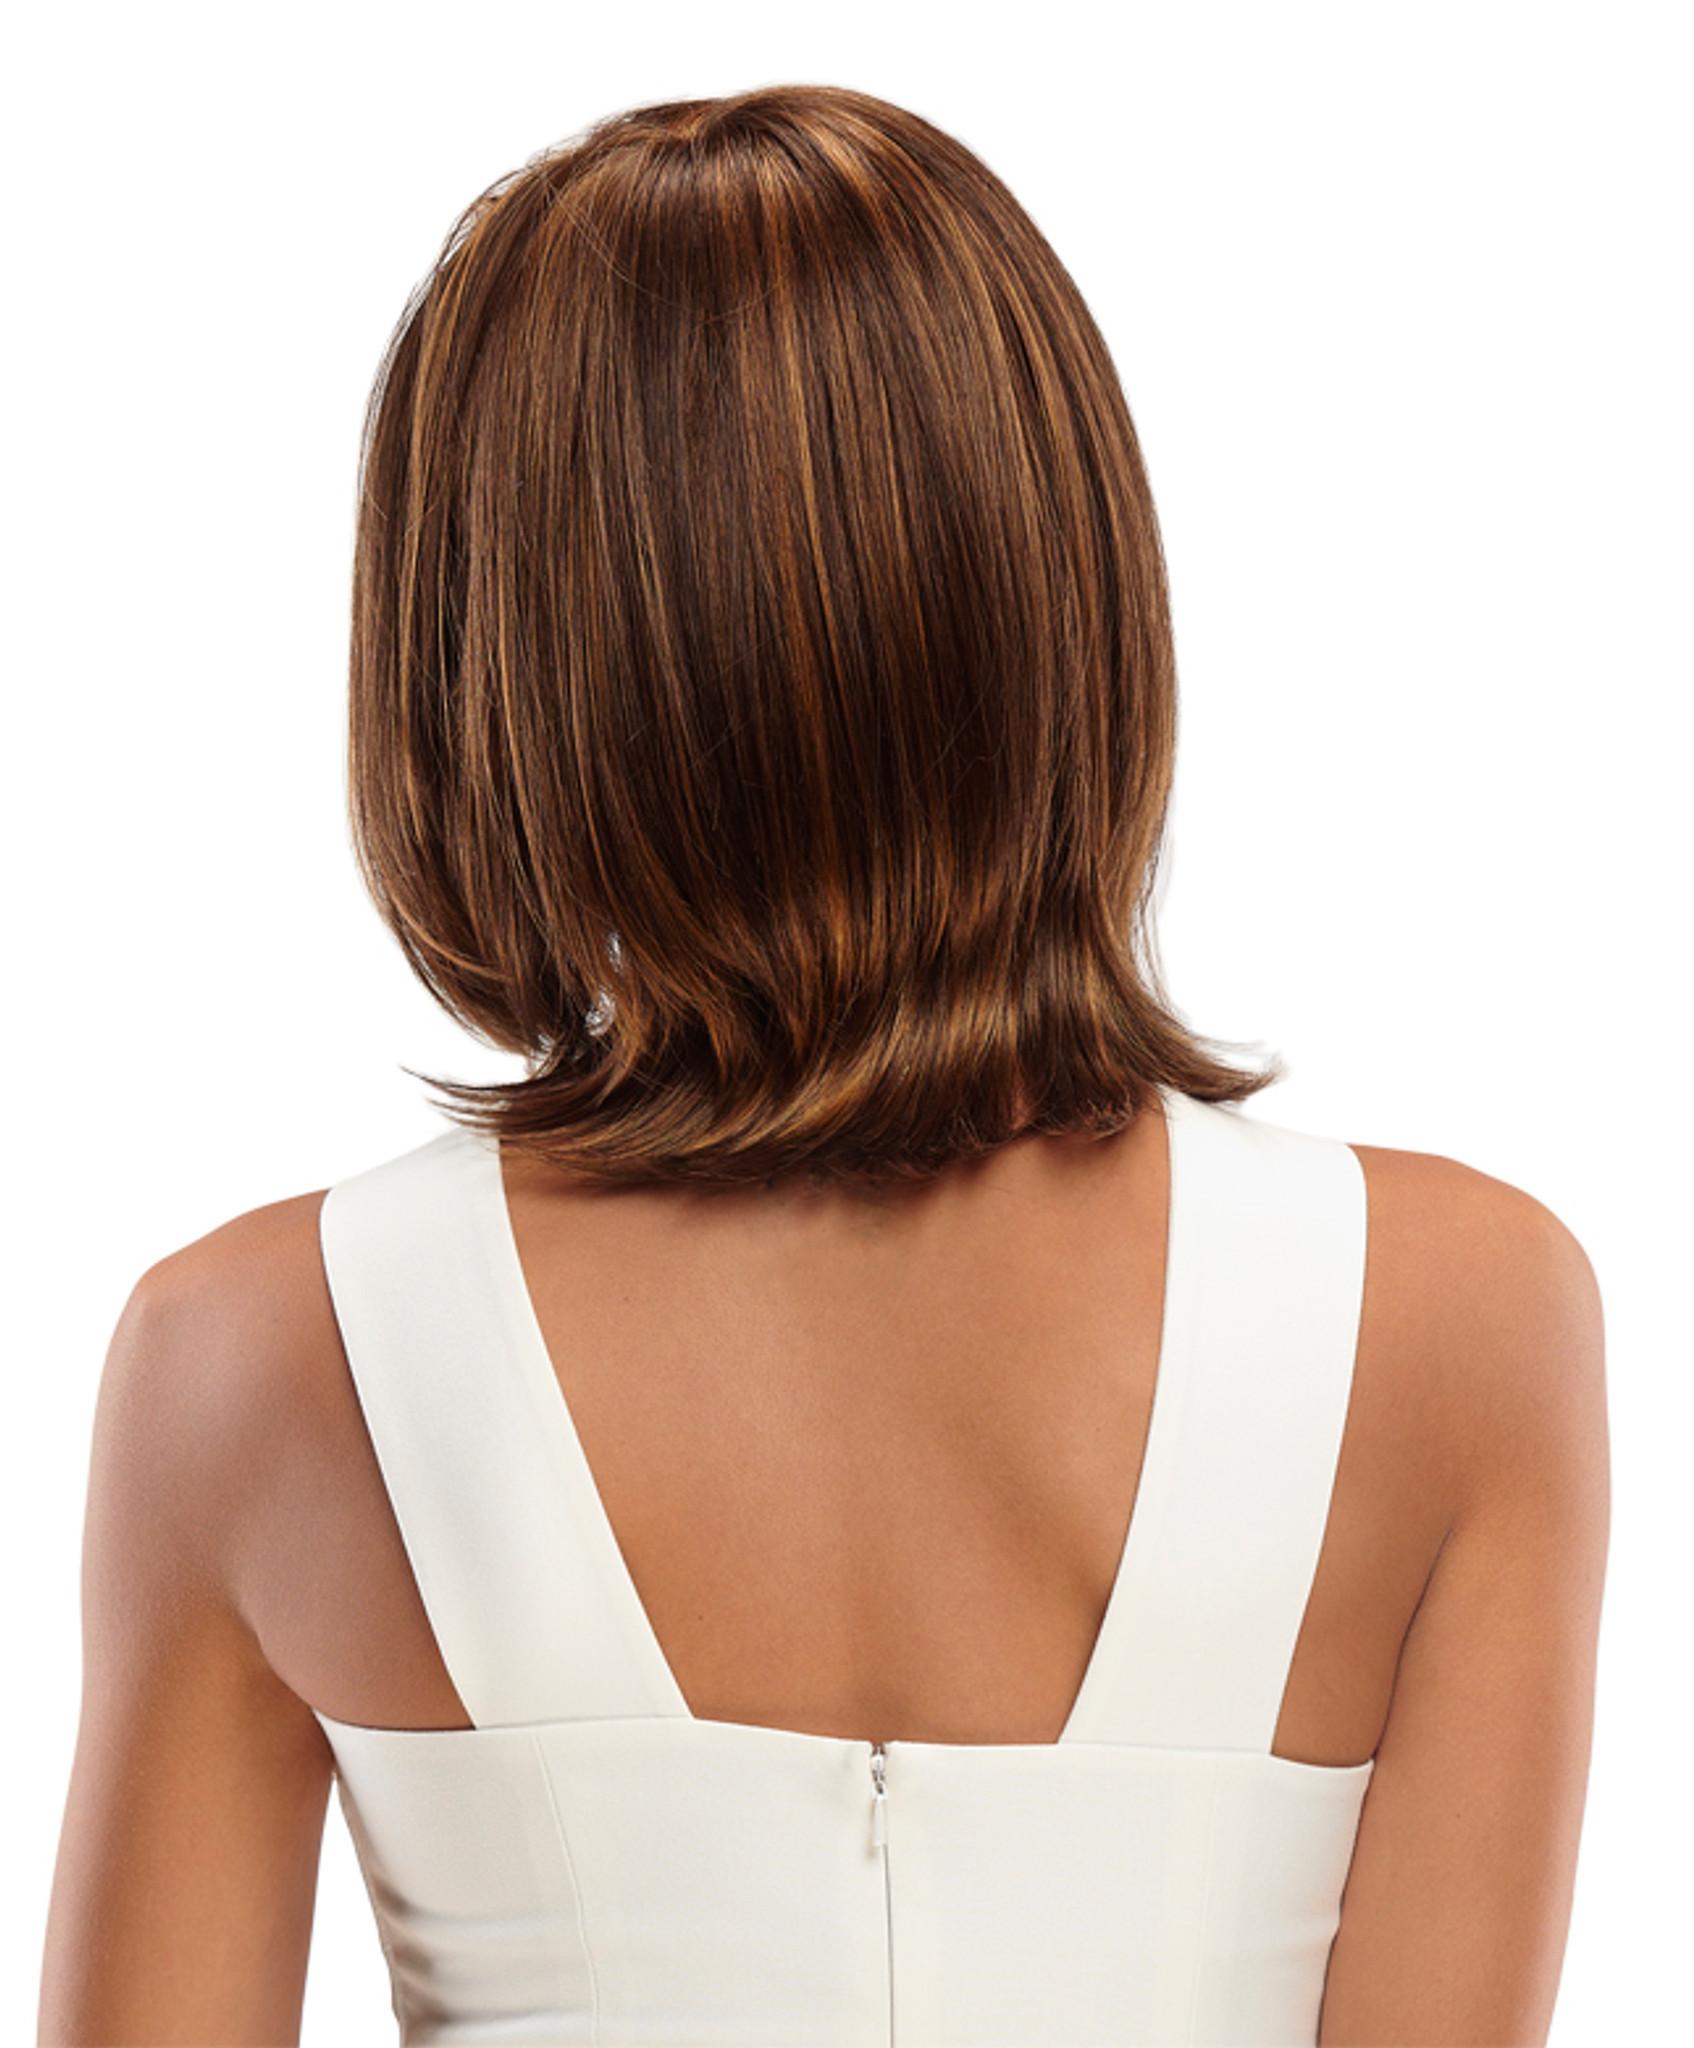 Alia Smartlace Synthetic Wig By Jon Renau Back View